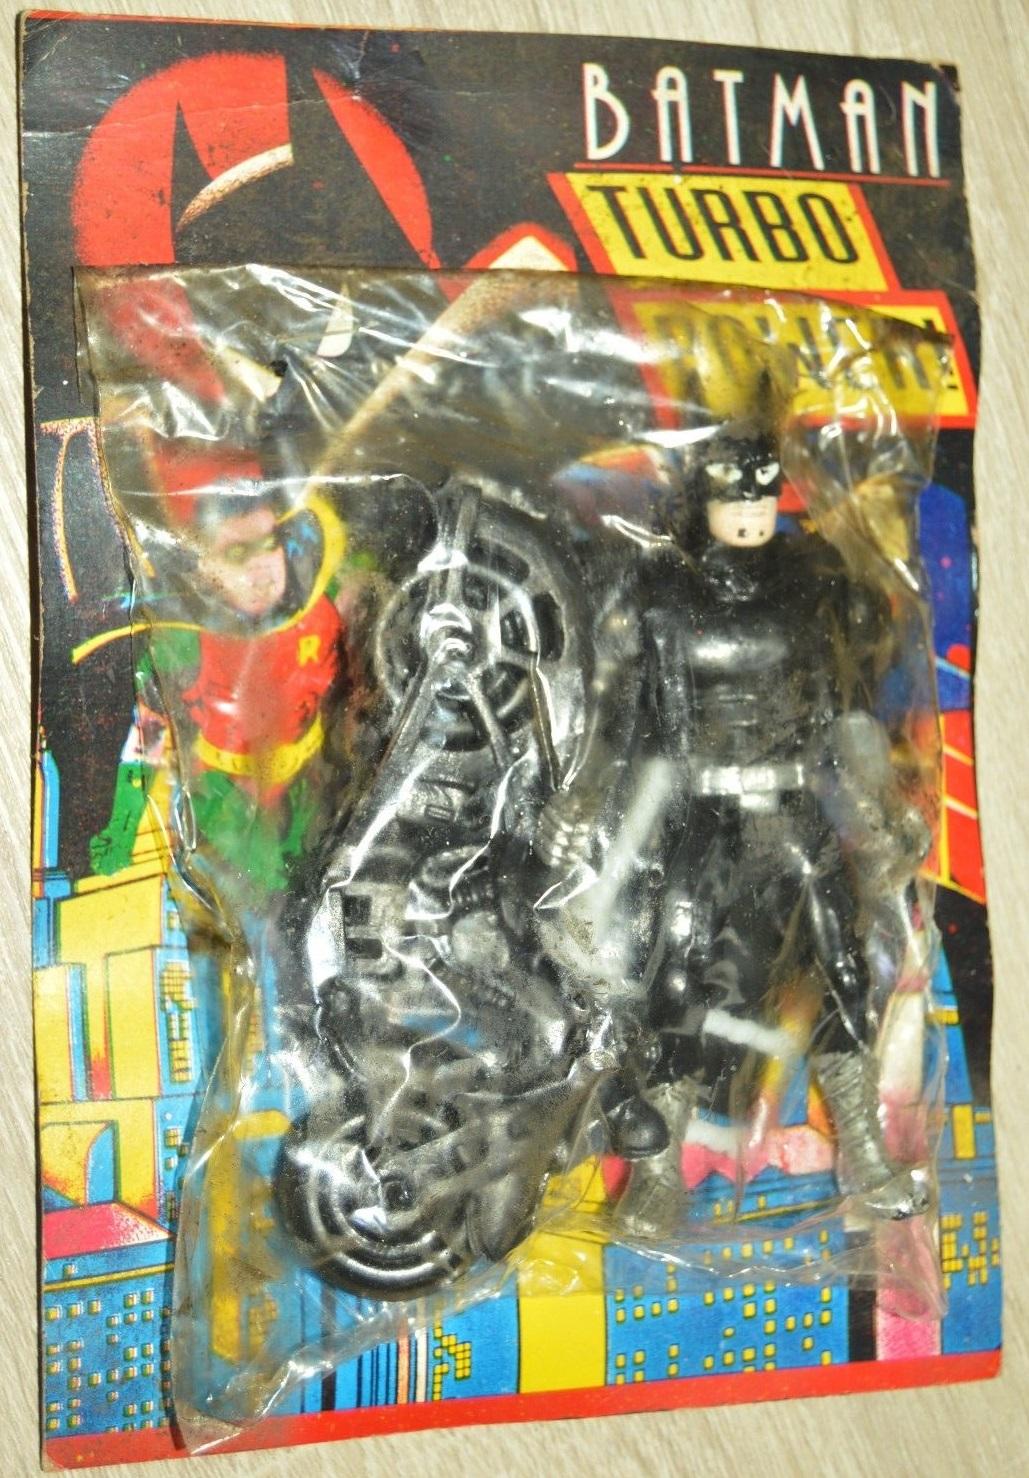 Batman (Turbo Power! figure)